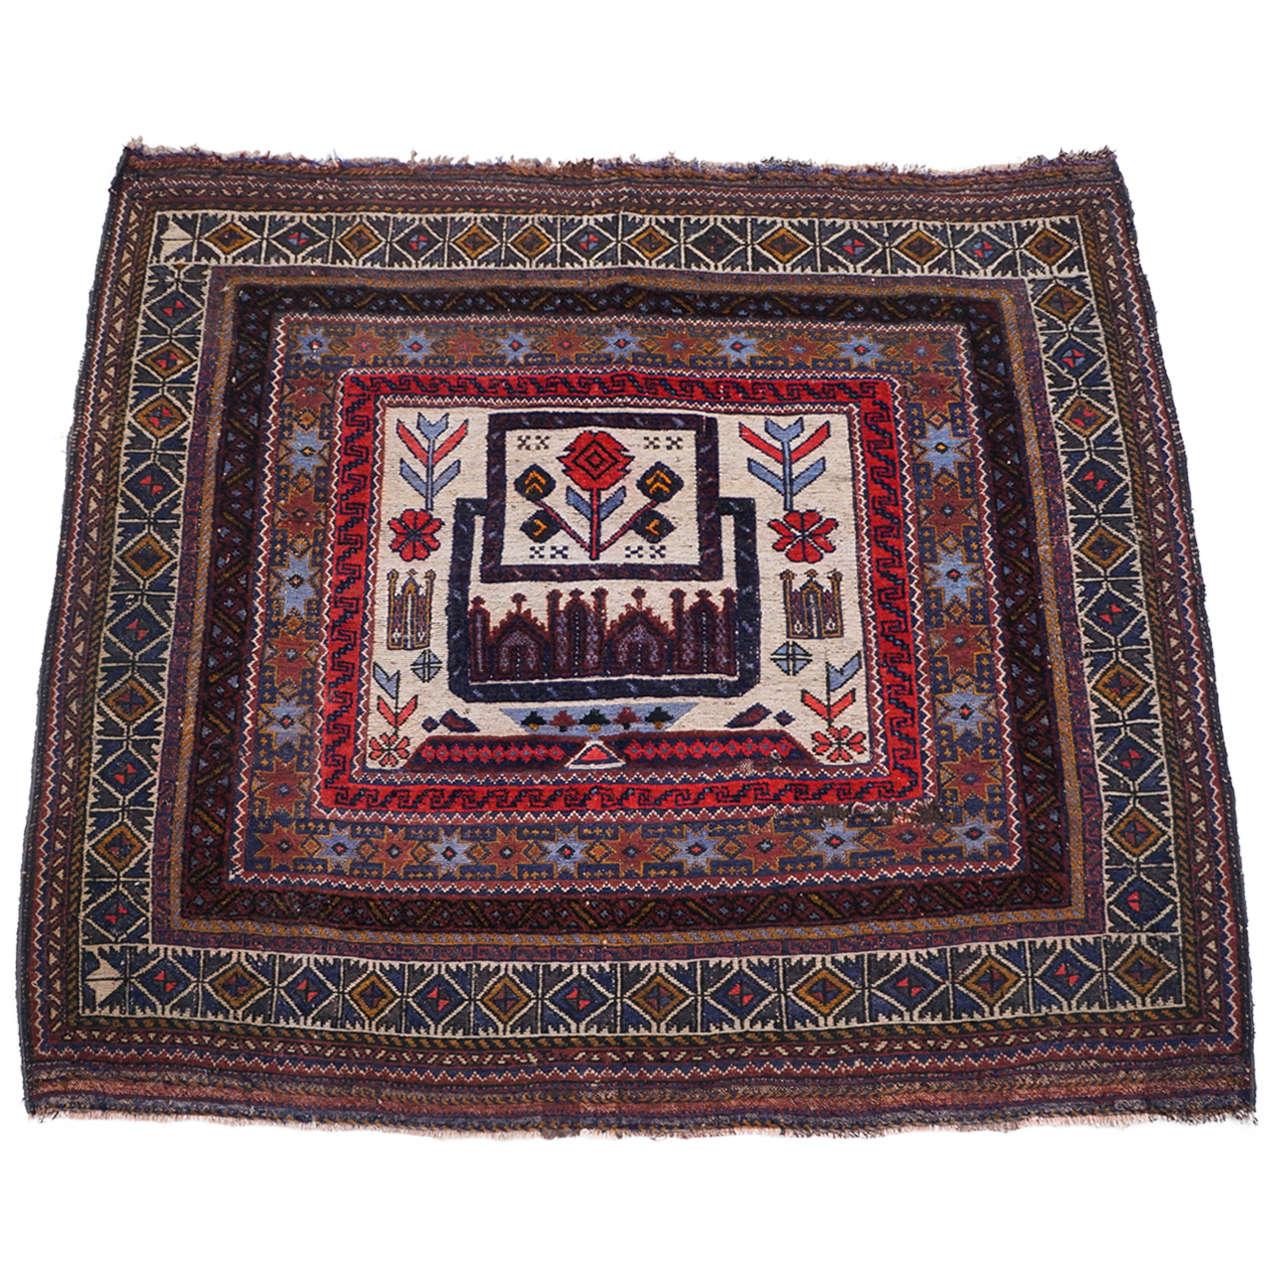 Throw Rugs On Sofas: Handmade Beautiful Throw Rug Or Carpet For Sale At 1stdibs